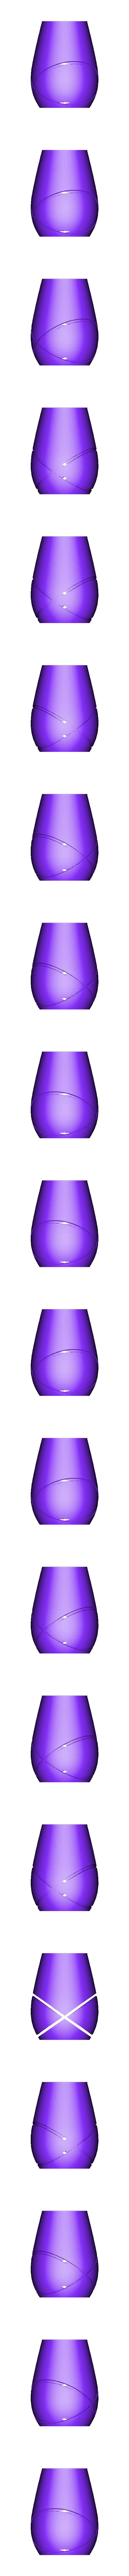 lamp_dual_extruder_v2_part_1.stl Download free STL file Kerosene lamp • 3D printer design, poblocki1982